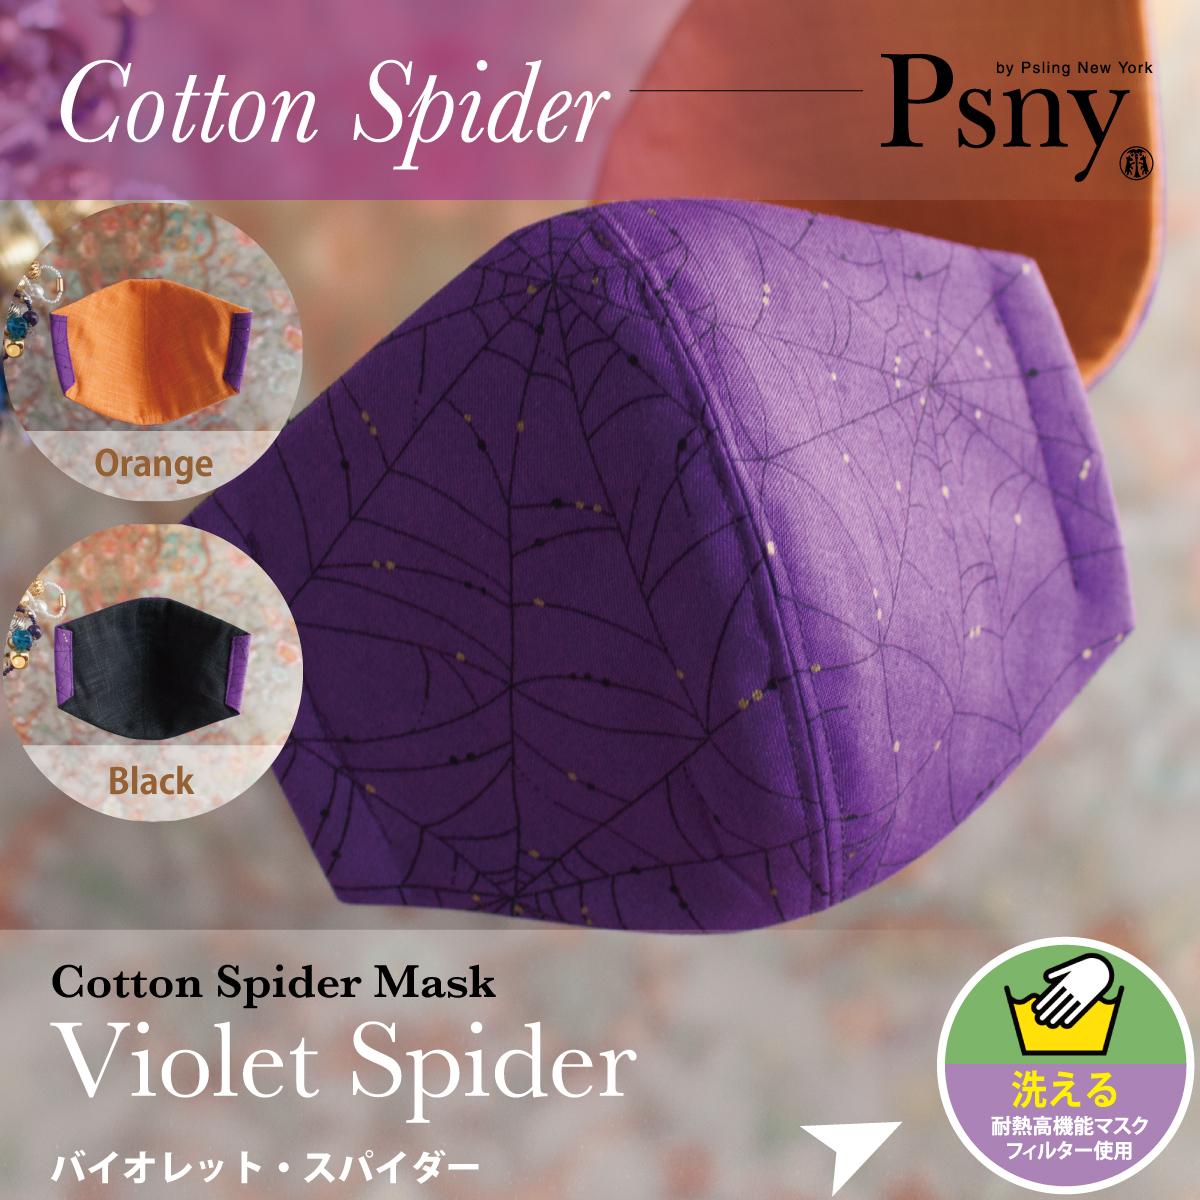 PSNY コットン スパイダー・バイオレット 花粉 黄砂 洗える不織布フィルター入り 立体 大人用 マスク 送料無料 C02